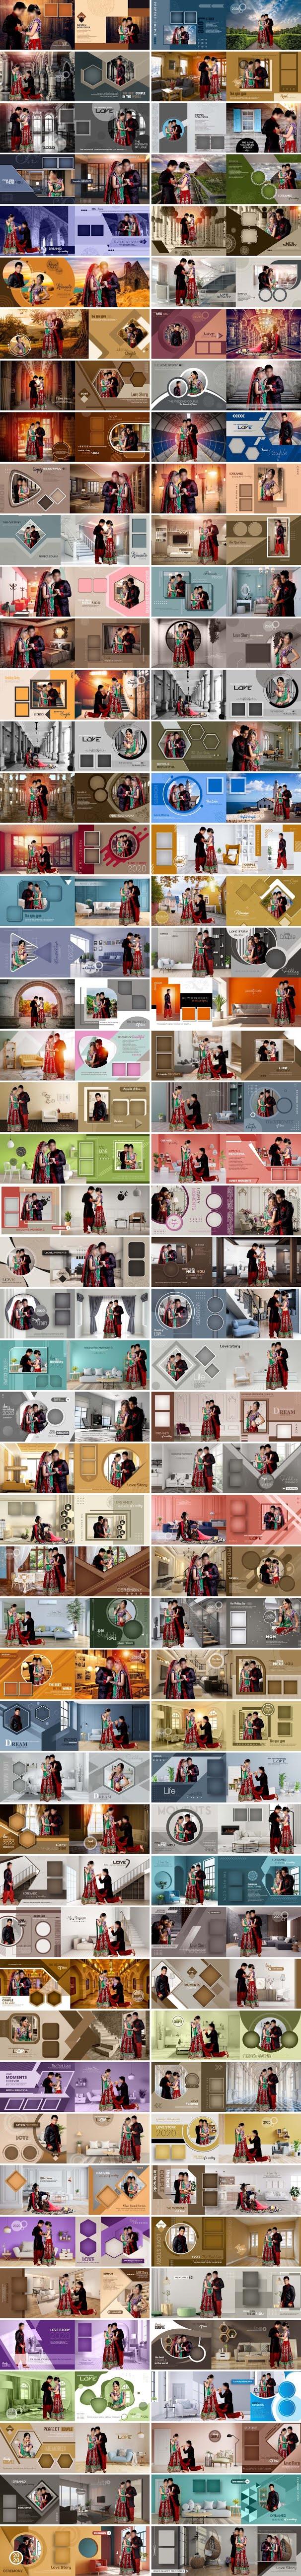 Wedding Album DM Designs PSD Bundle